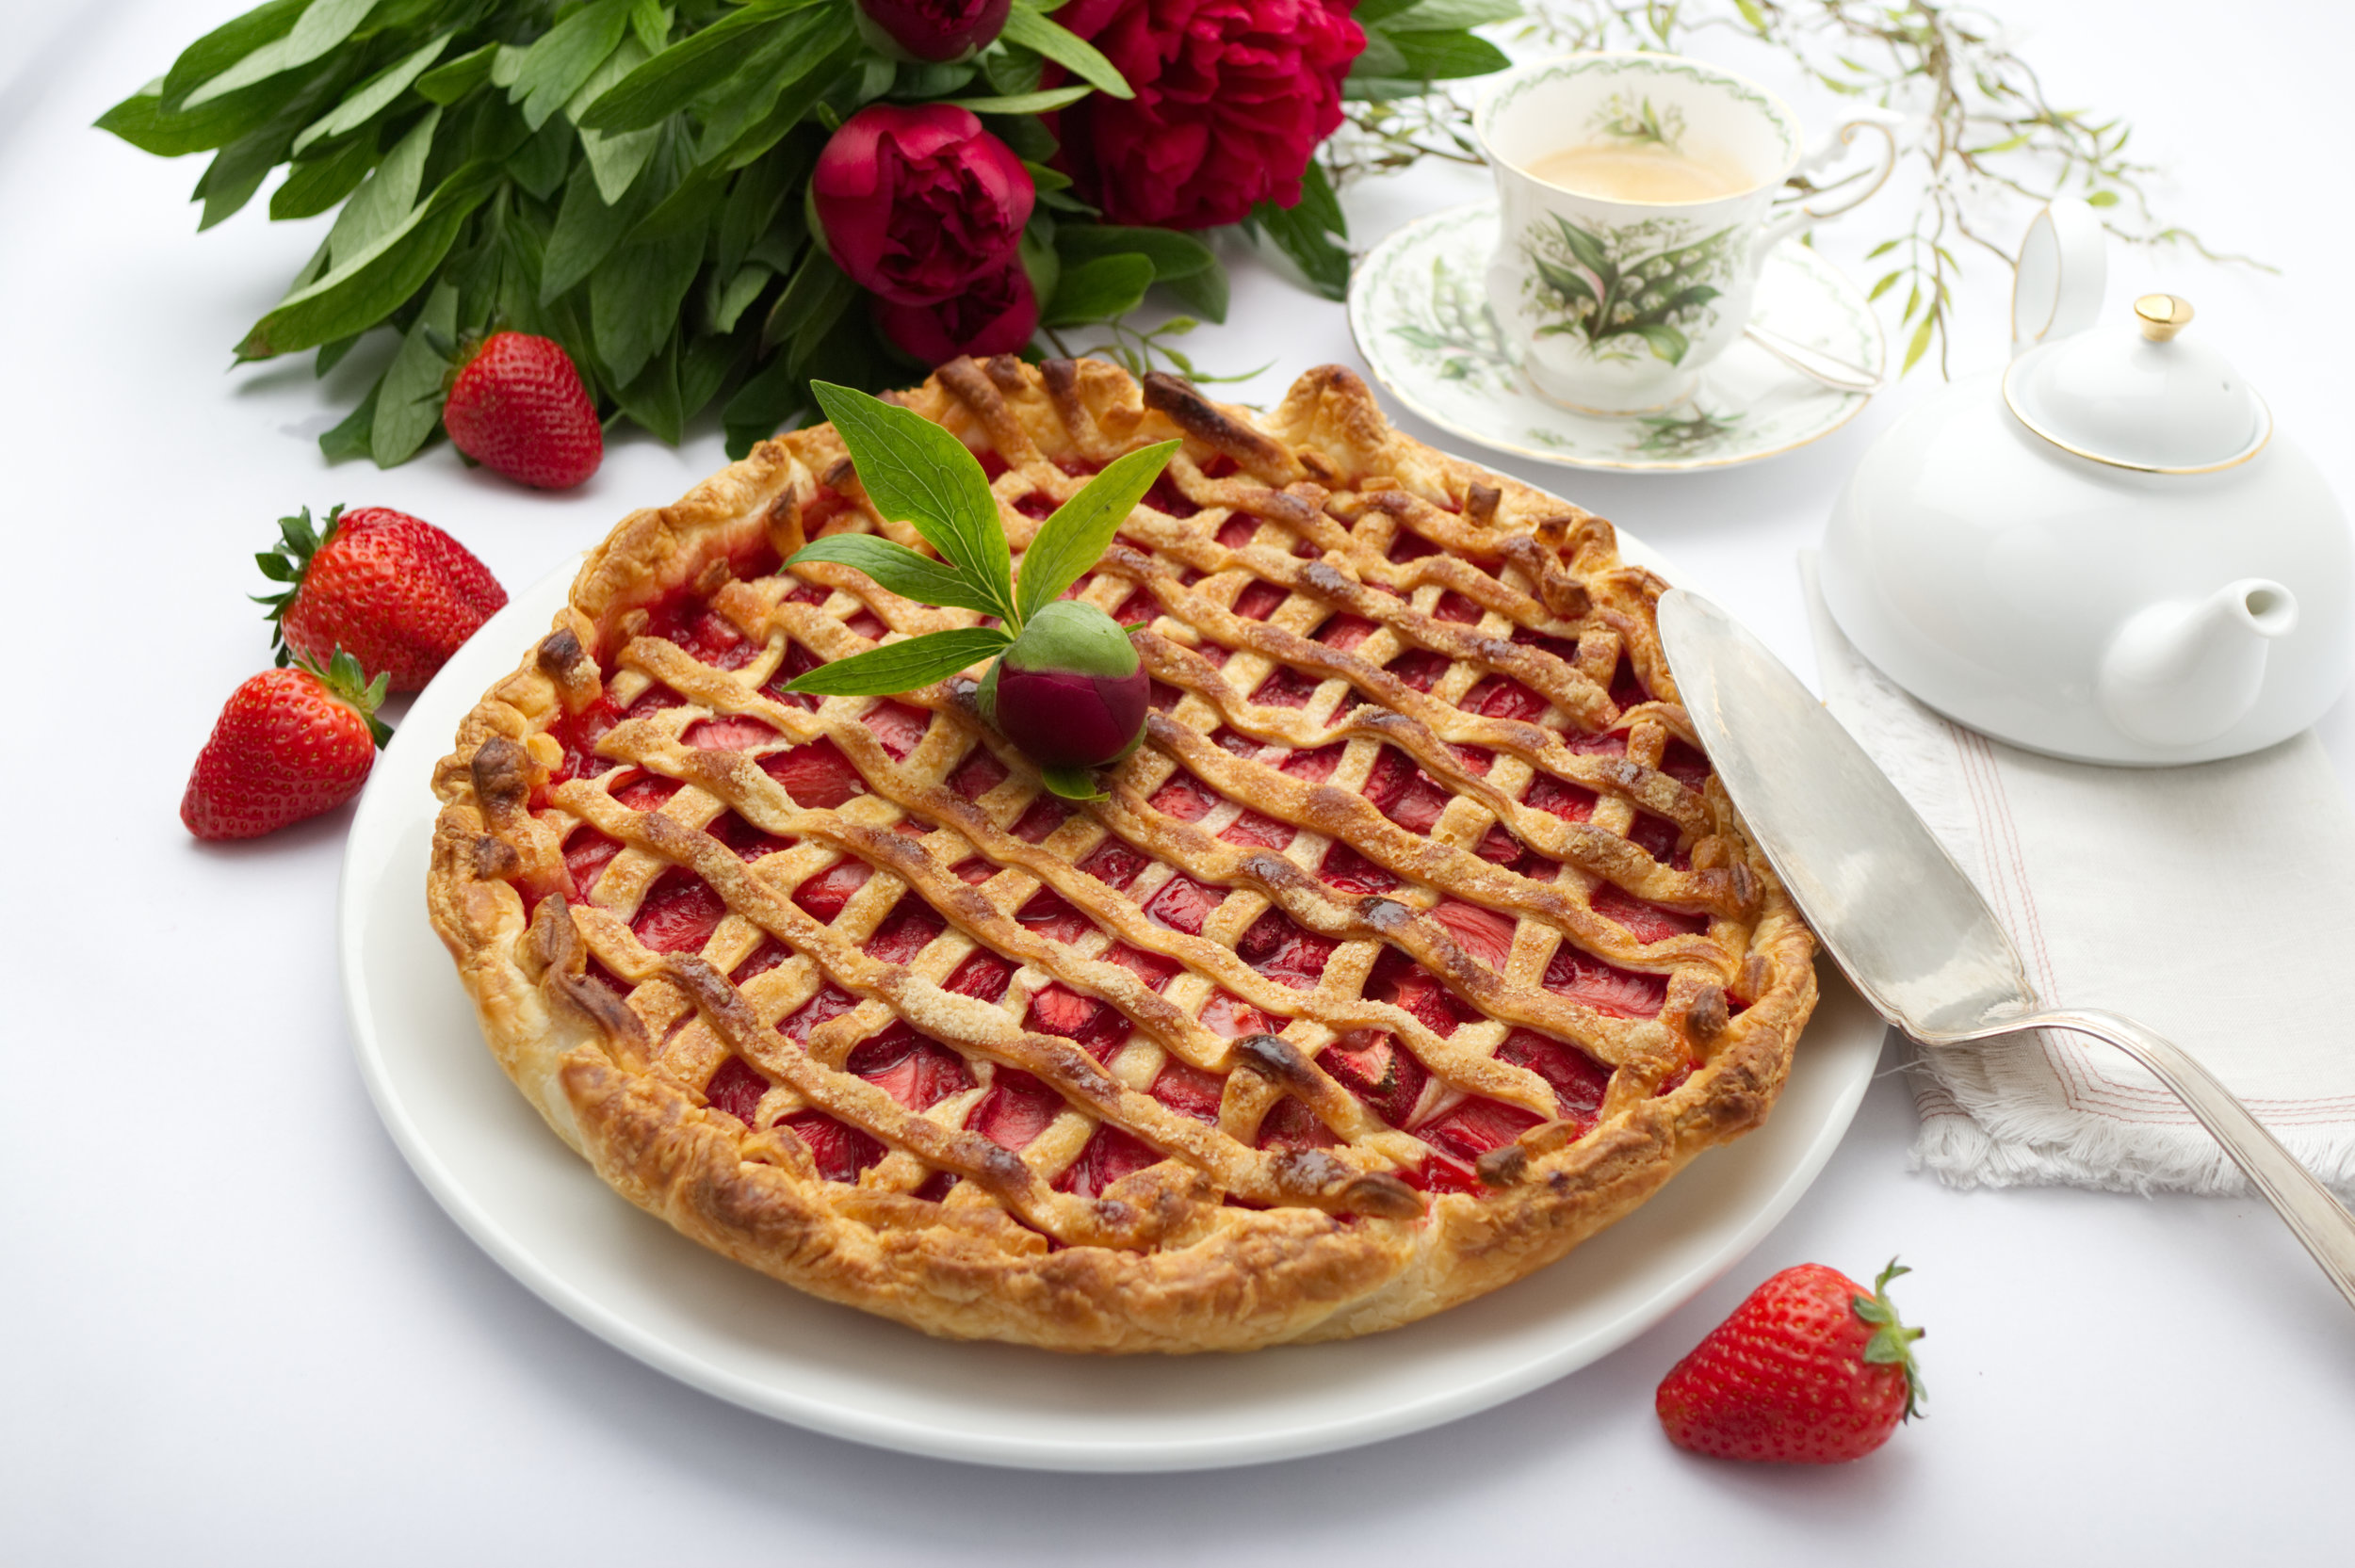 Erdbeer Tarte.jpg